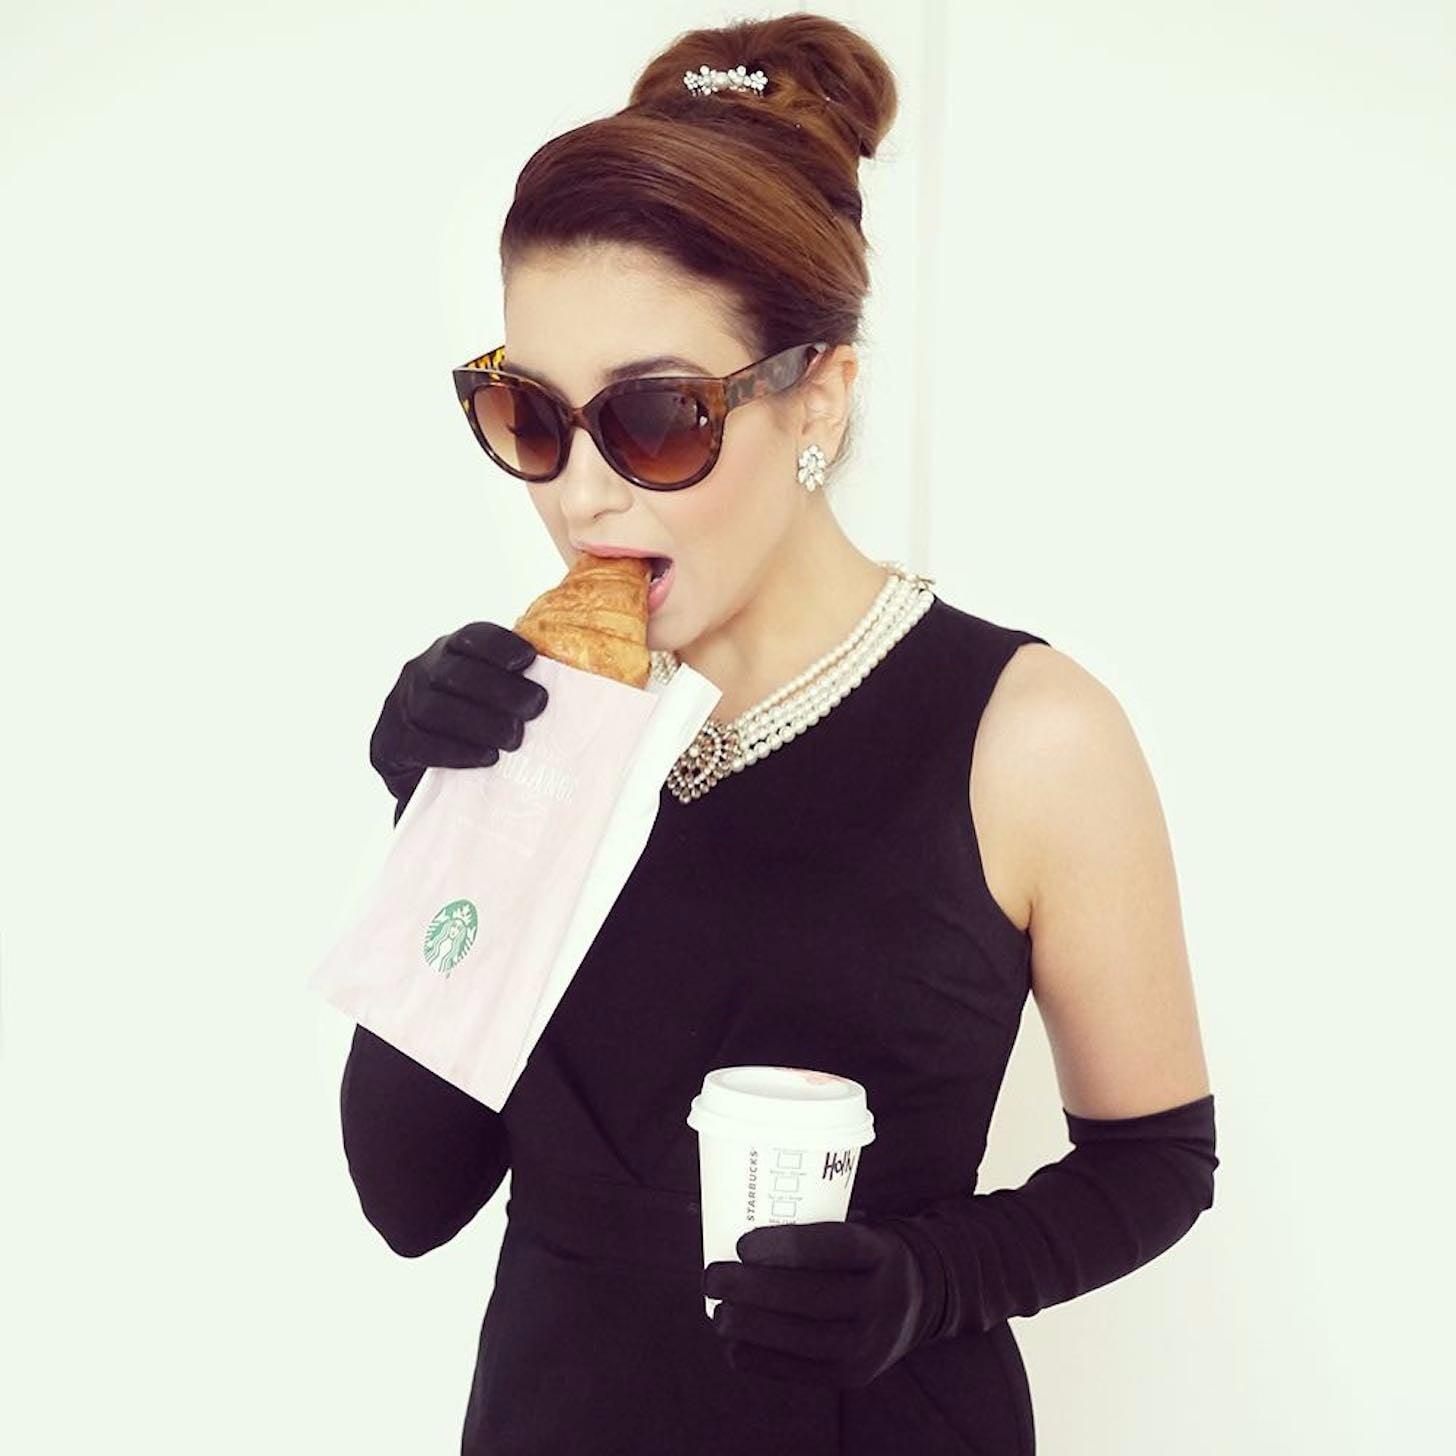 halloween costume ideas with a black dress | popsugar fashion